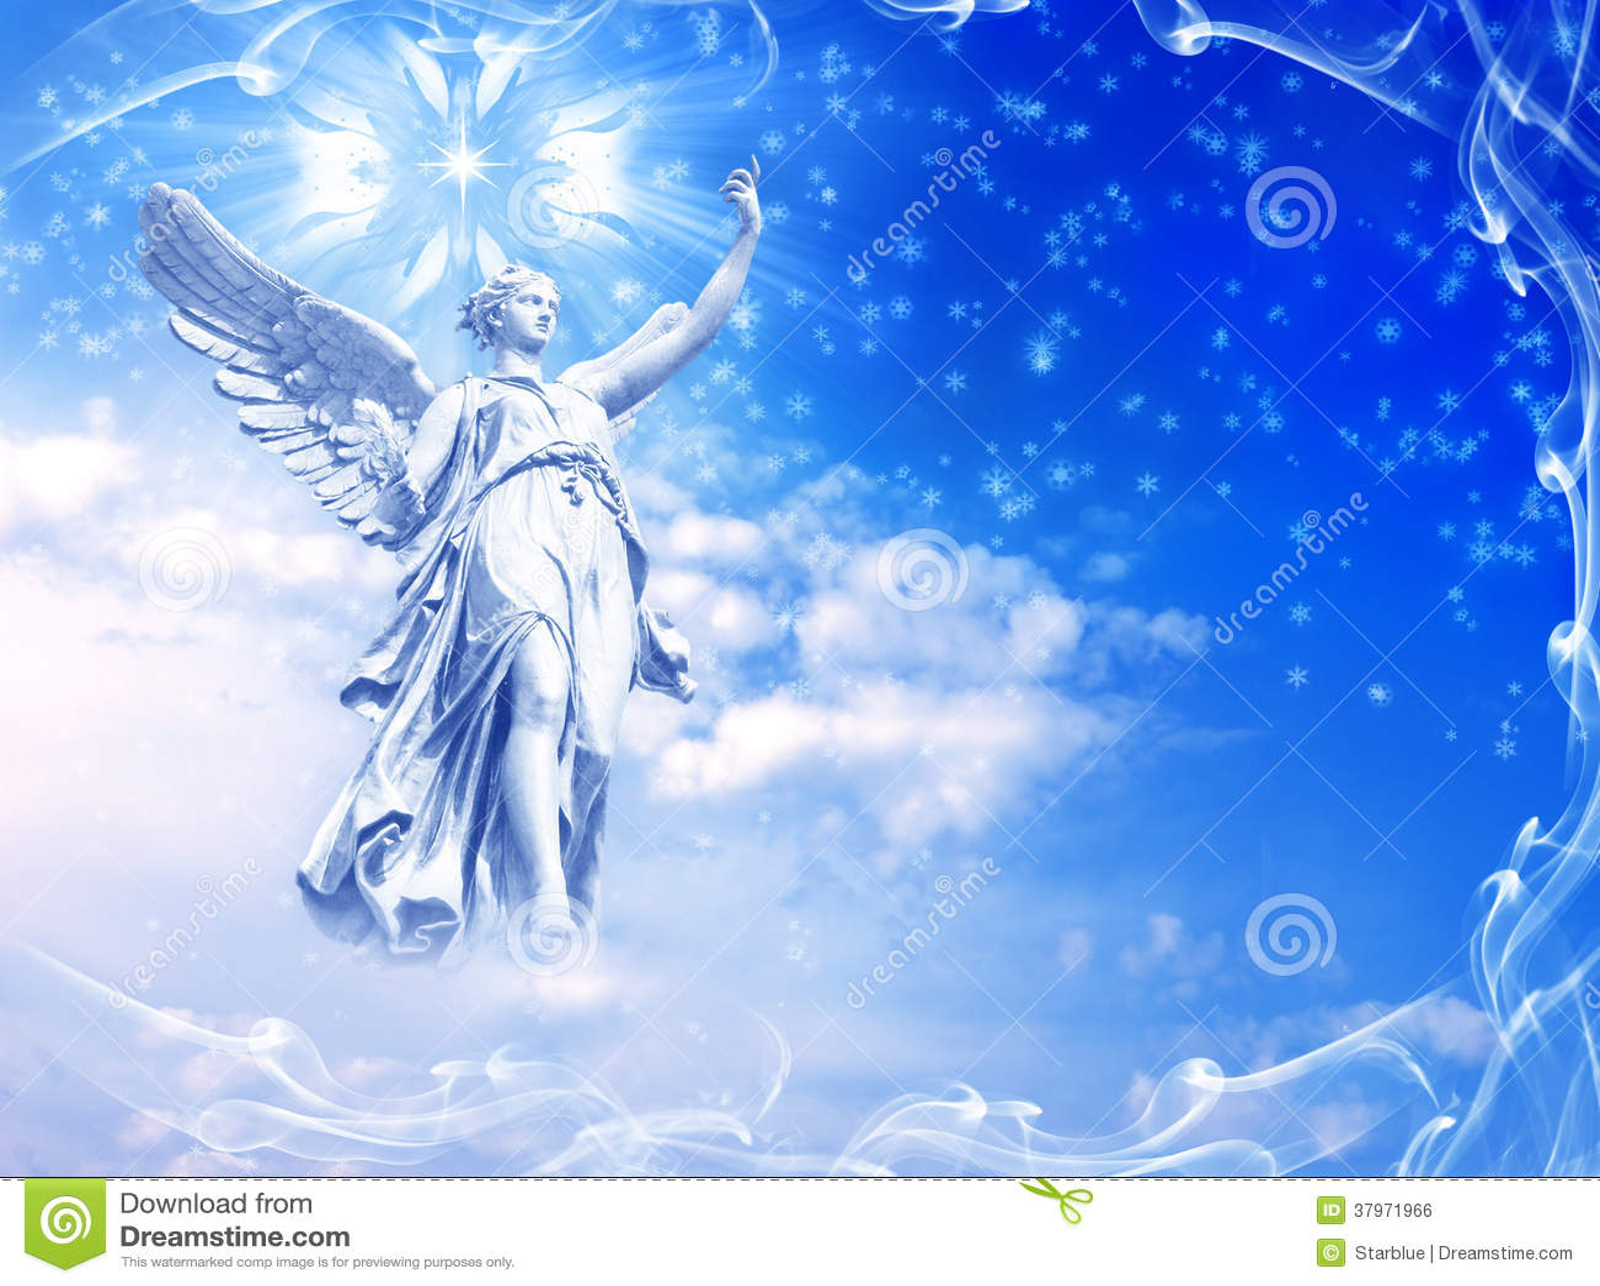 Winter angel stock photo. Image of divinity, angelic ...